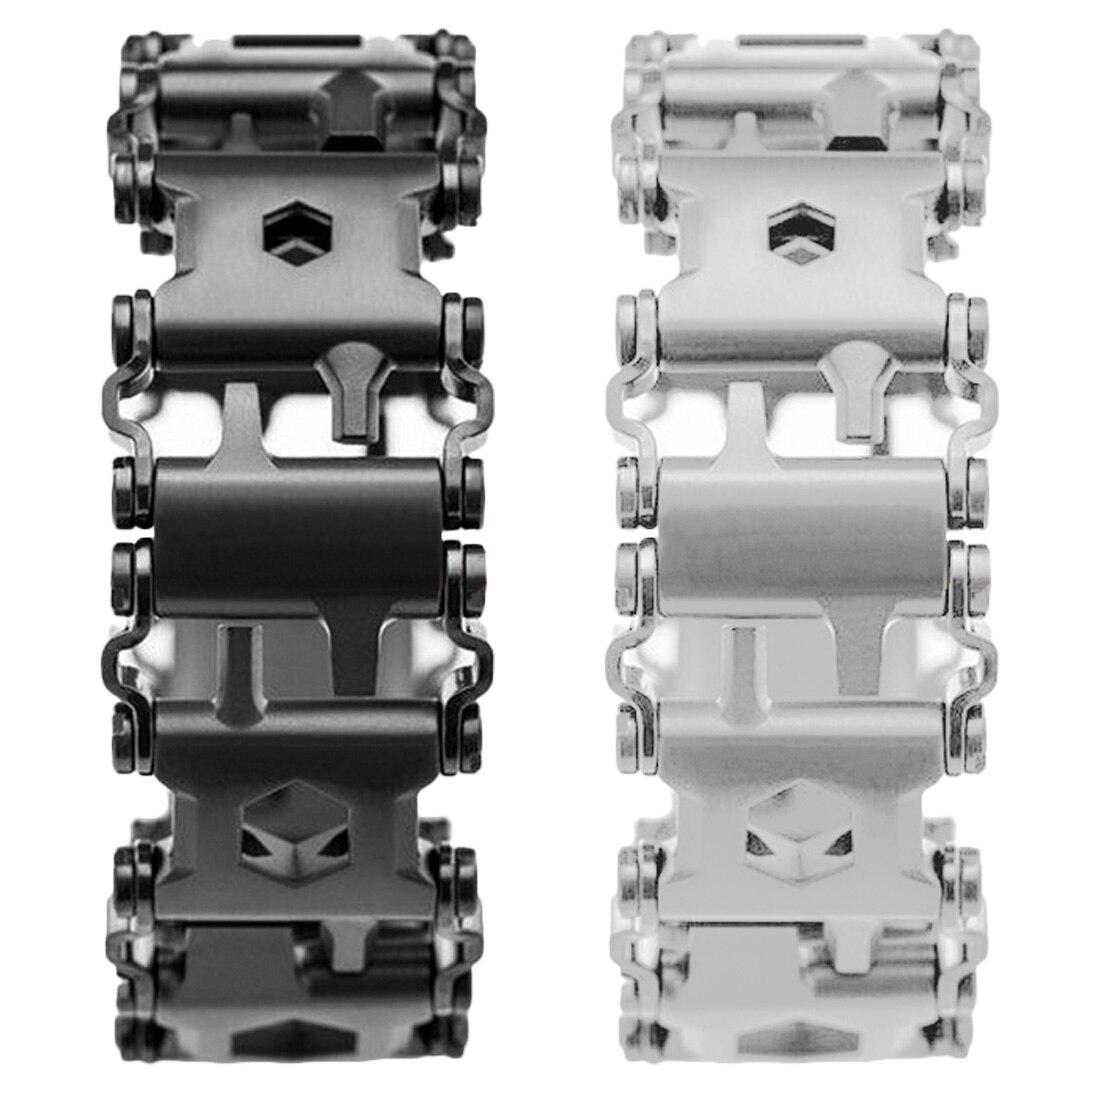 29 In 1 Multi-funktion Tragbare Lauffläche Armband Armband Multi-funktion Schraubendreher Outdoor Notfall Multi Tool